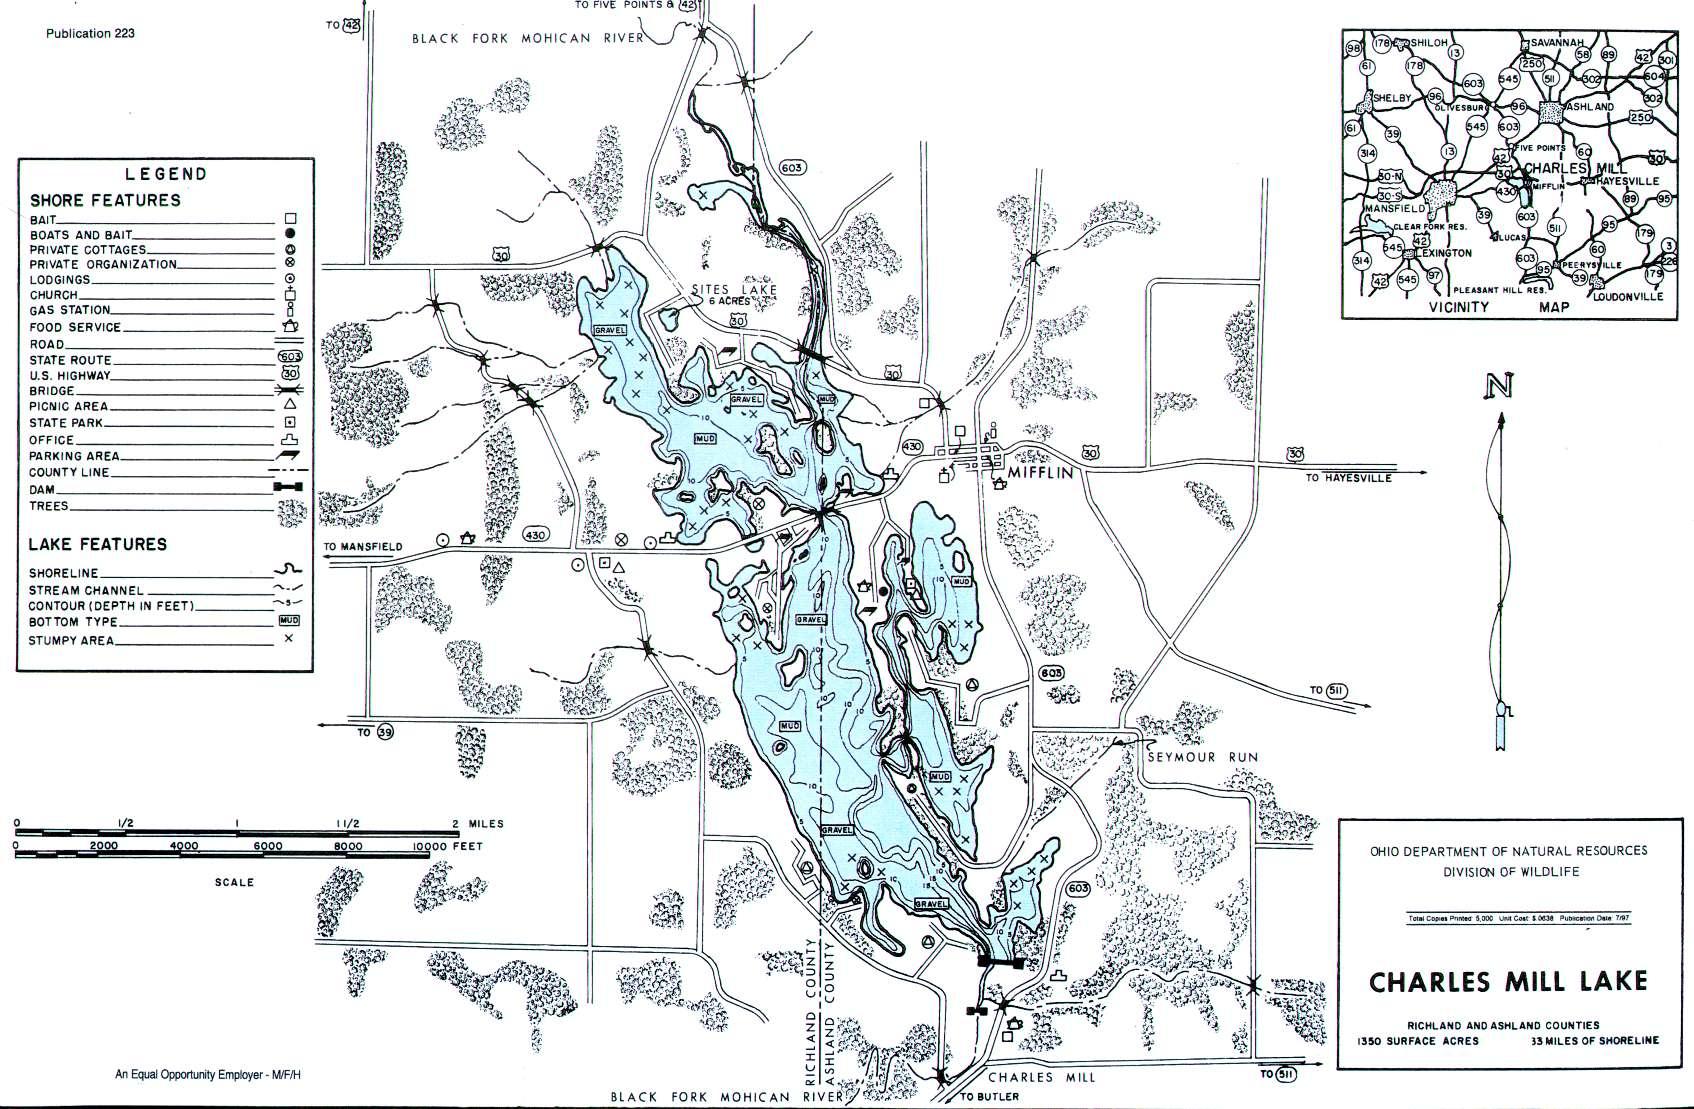 Charles Mill Lake Fishing Map - GoFishOhio